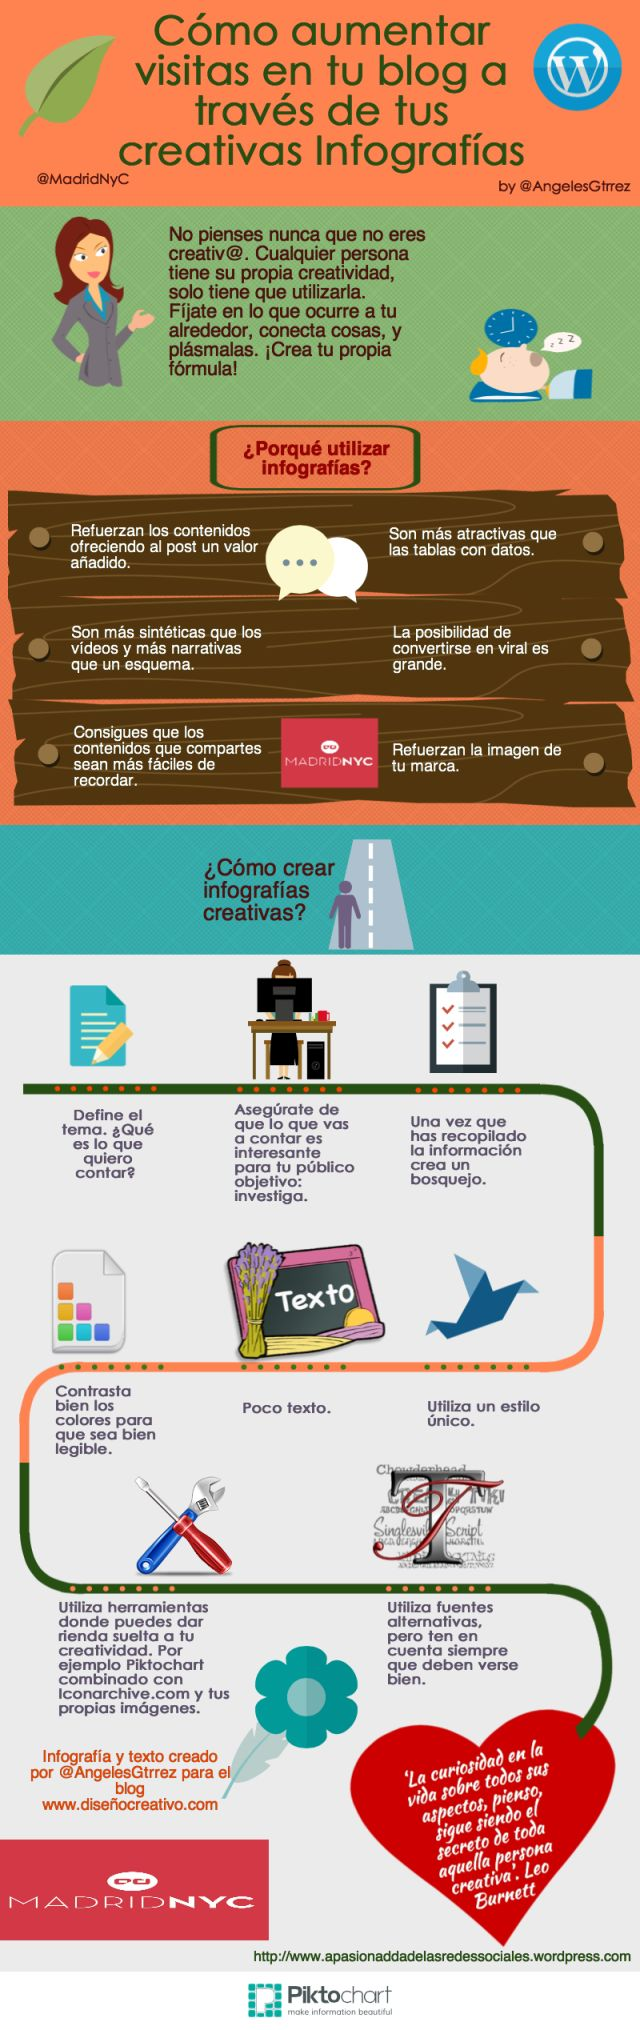 #Infografia Cómo aumentar visitas en tu blog a través de creativas Infografías